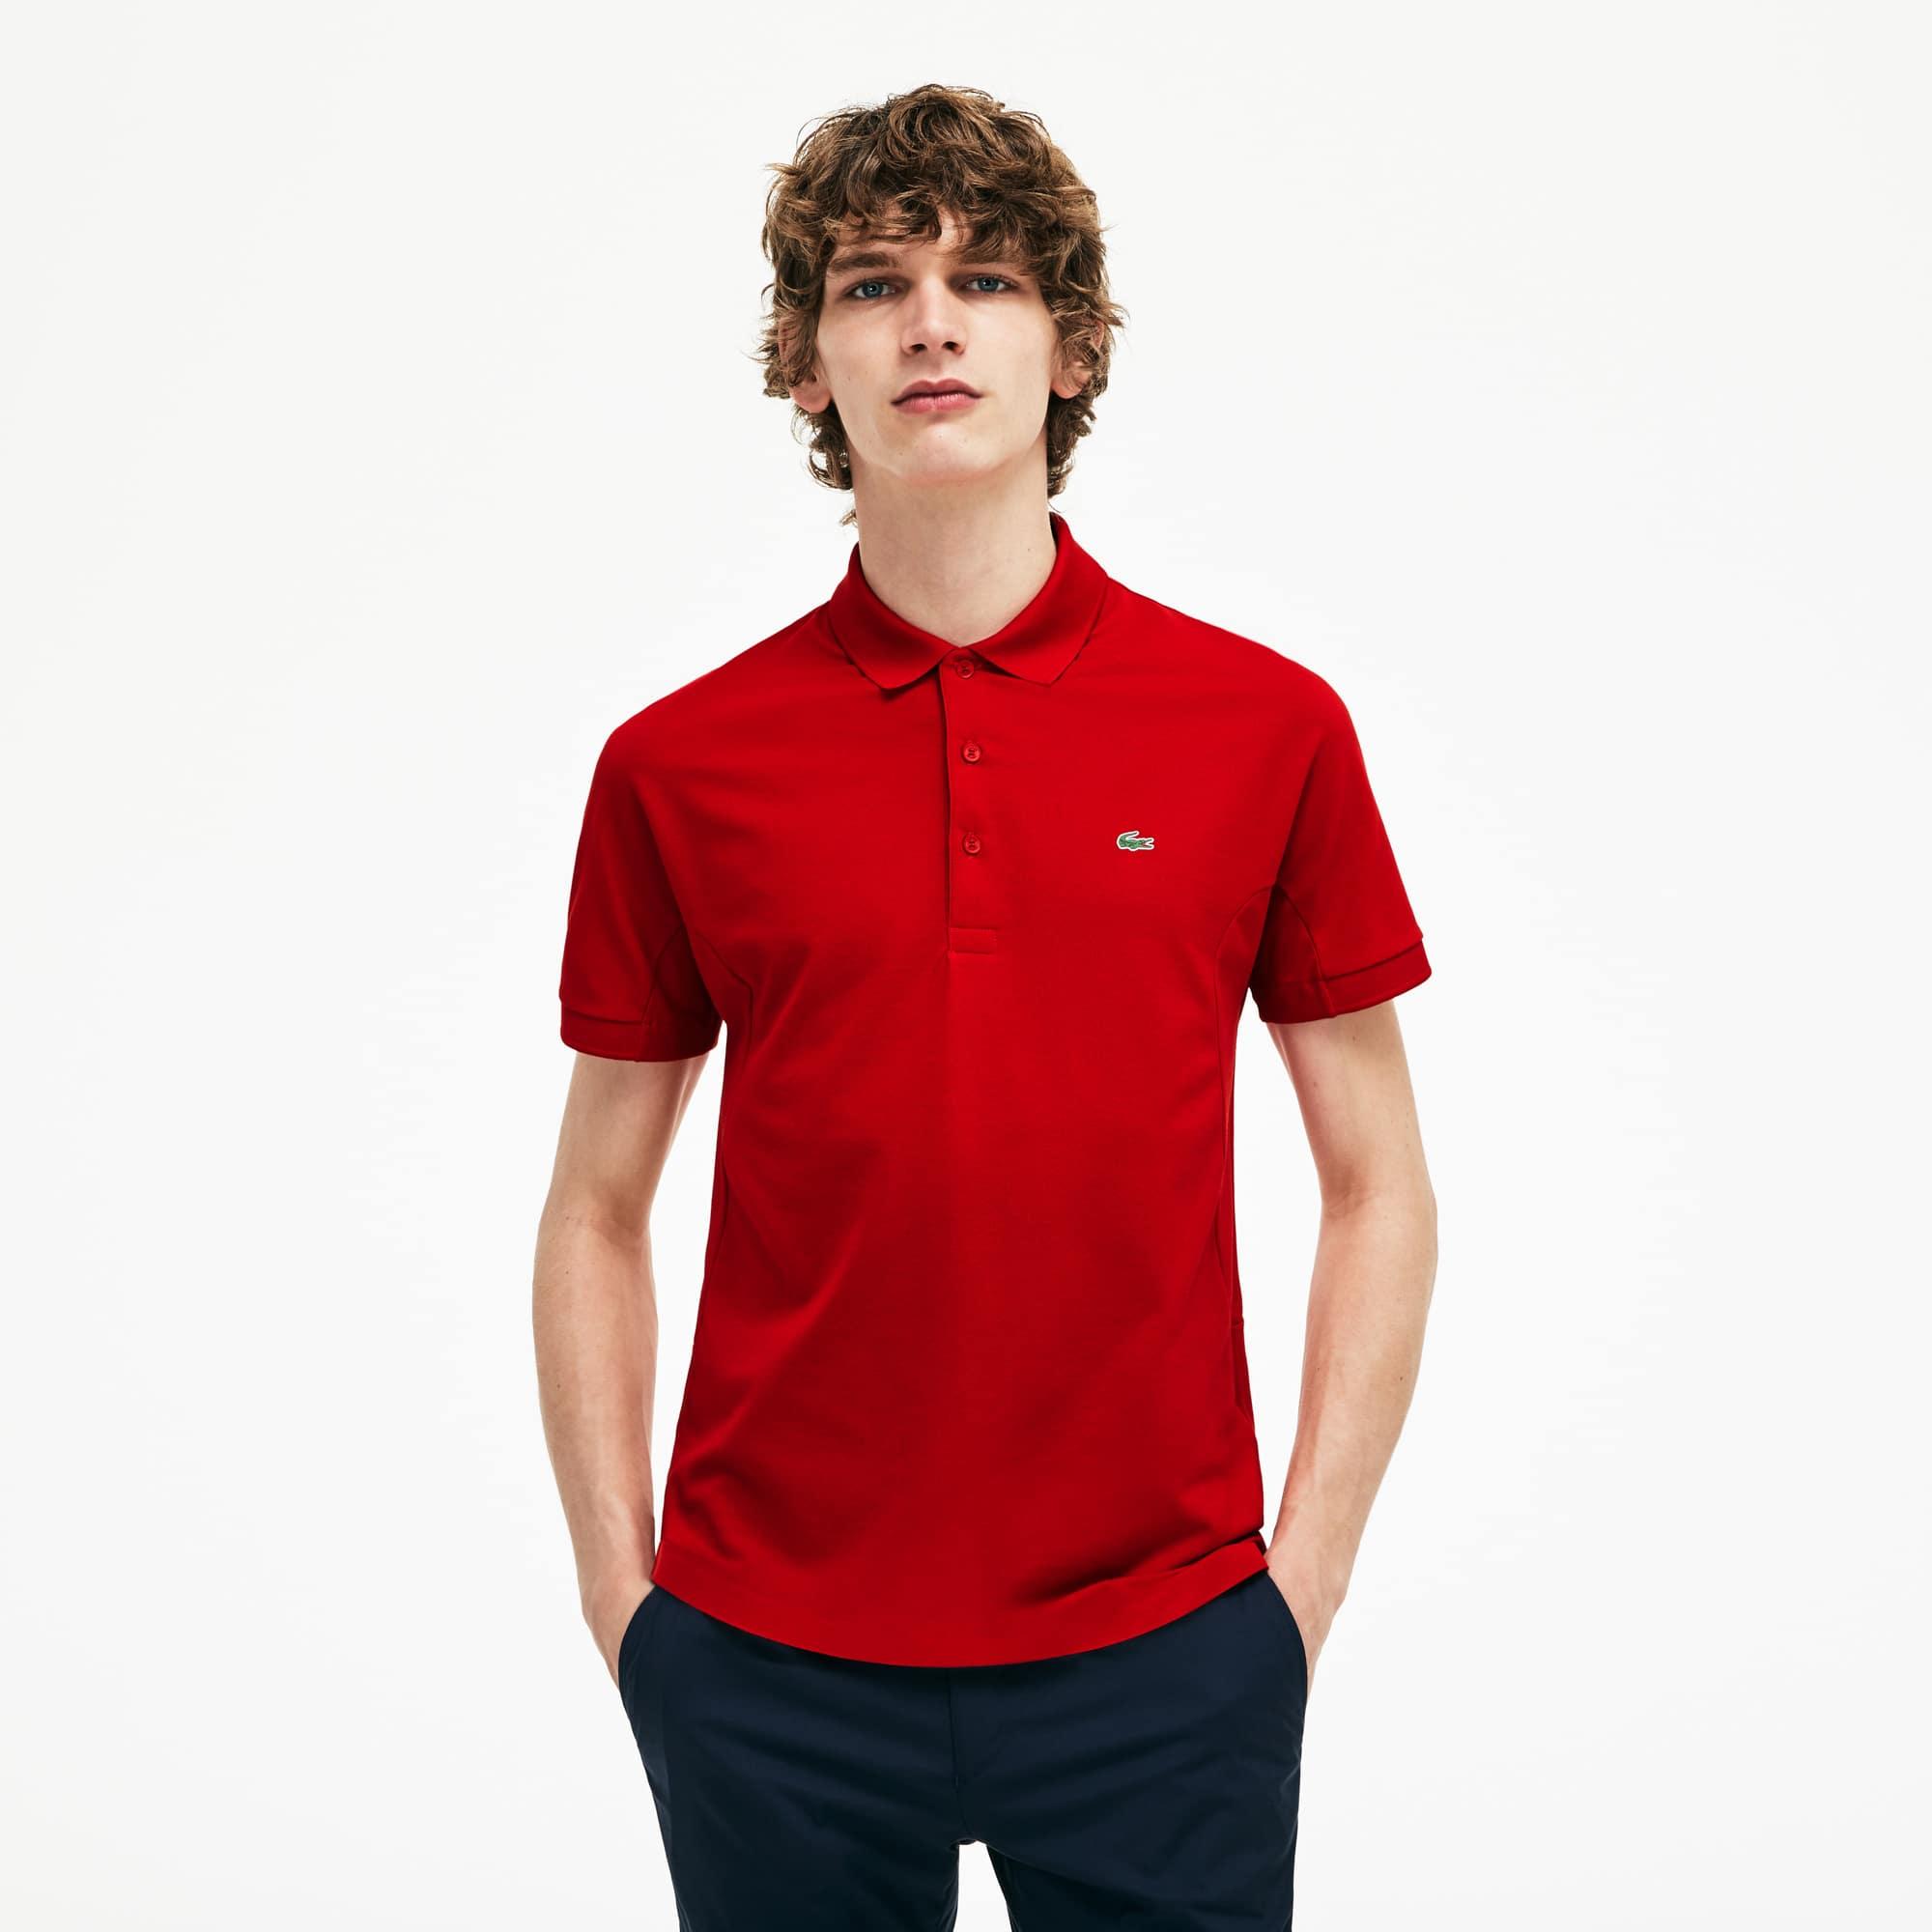 Men's Lacoste 85th Anniversary Limited Edition Tech Piqué Polo Shirt